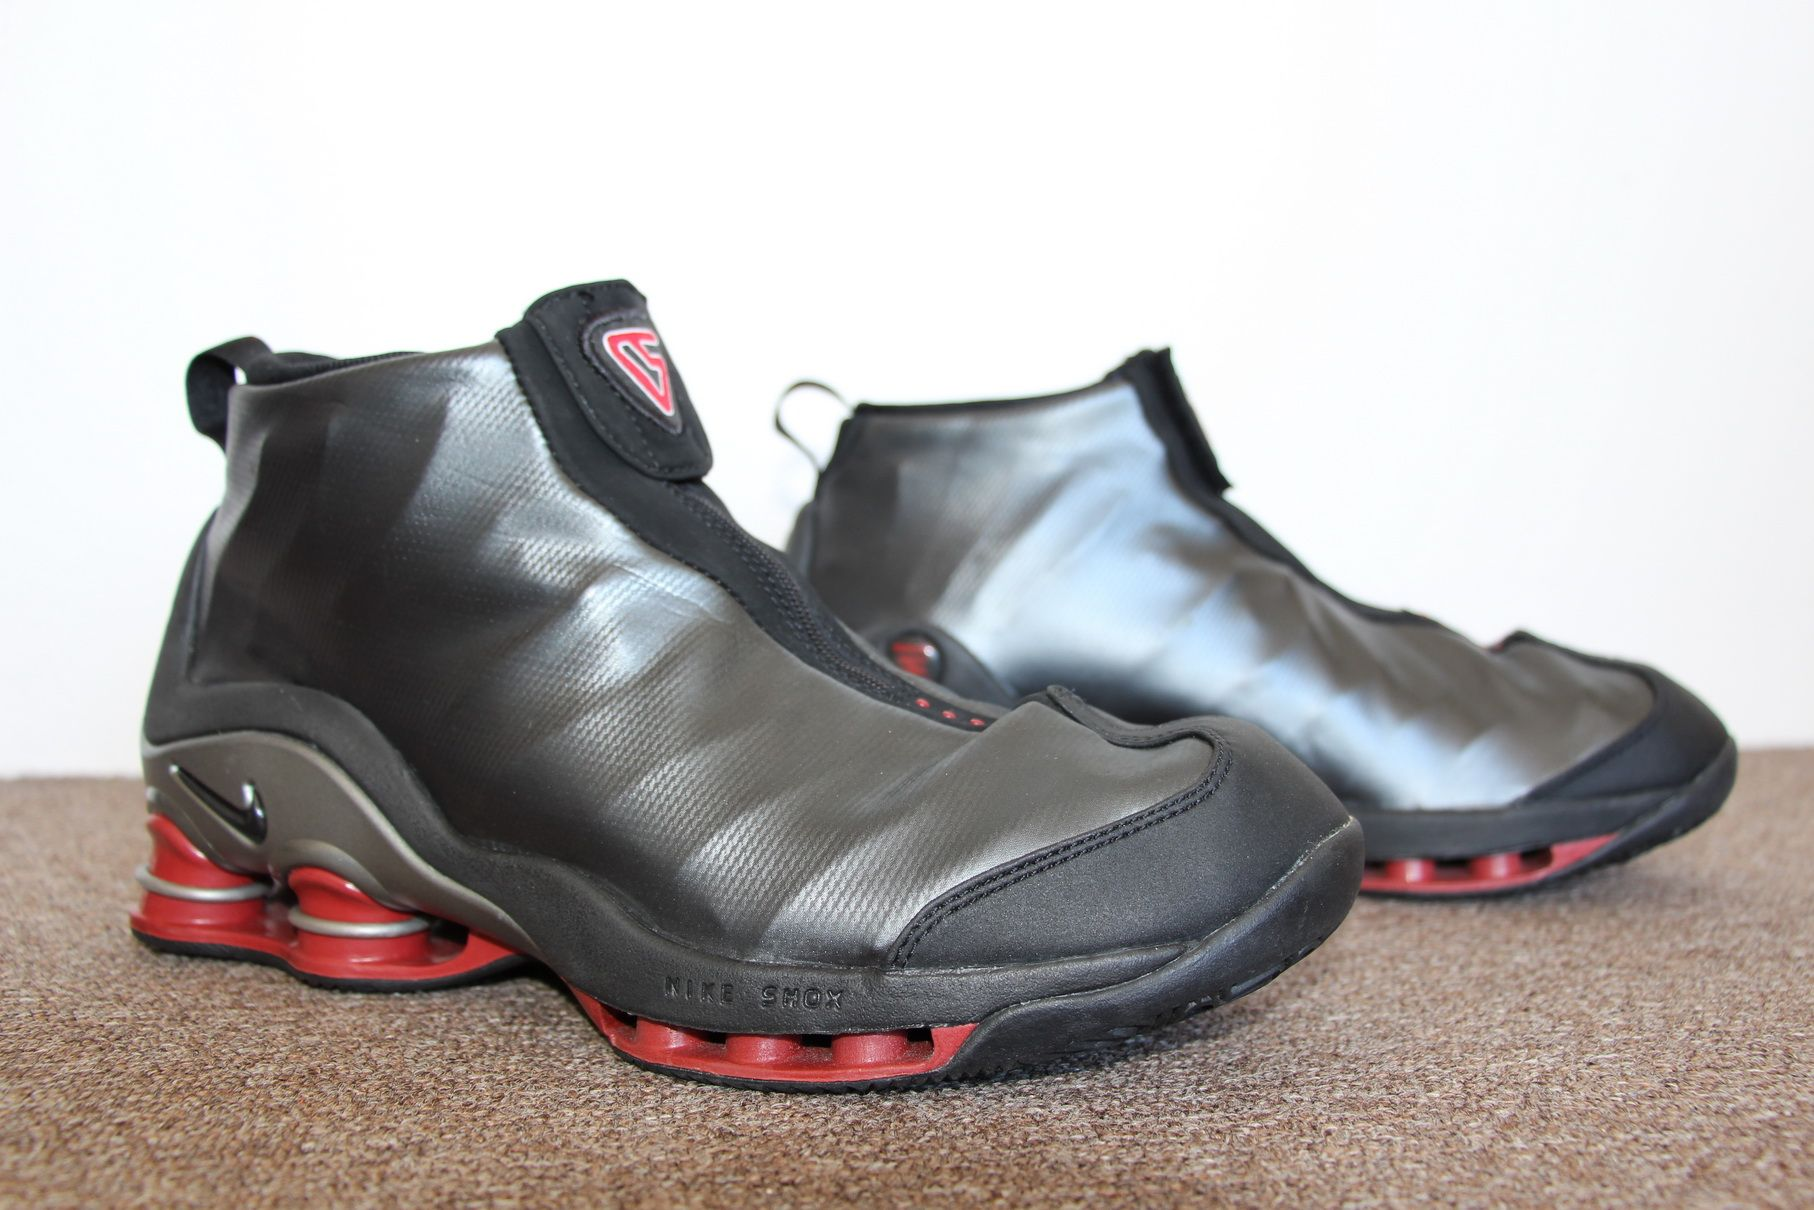 wholesale dealer 99440 4b8cc Nike Shox Vince Carter 2001 (Black Varsity Red   Metallic-Silver)   Sneakers  For Sale   Pinterest   Nike shox, Metallic and Nike basketball